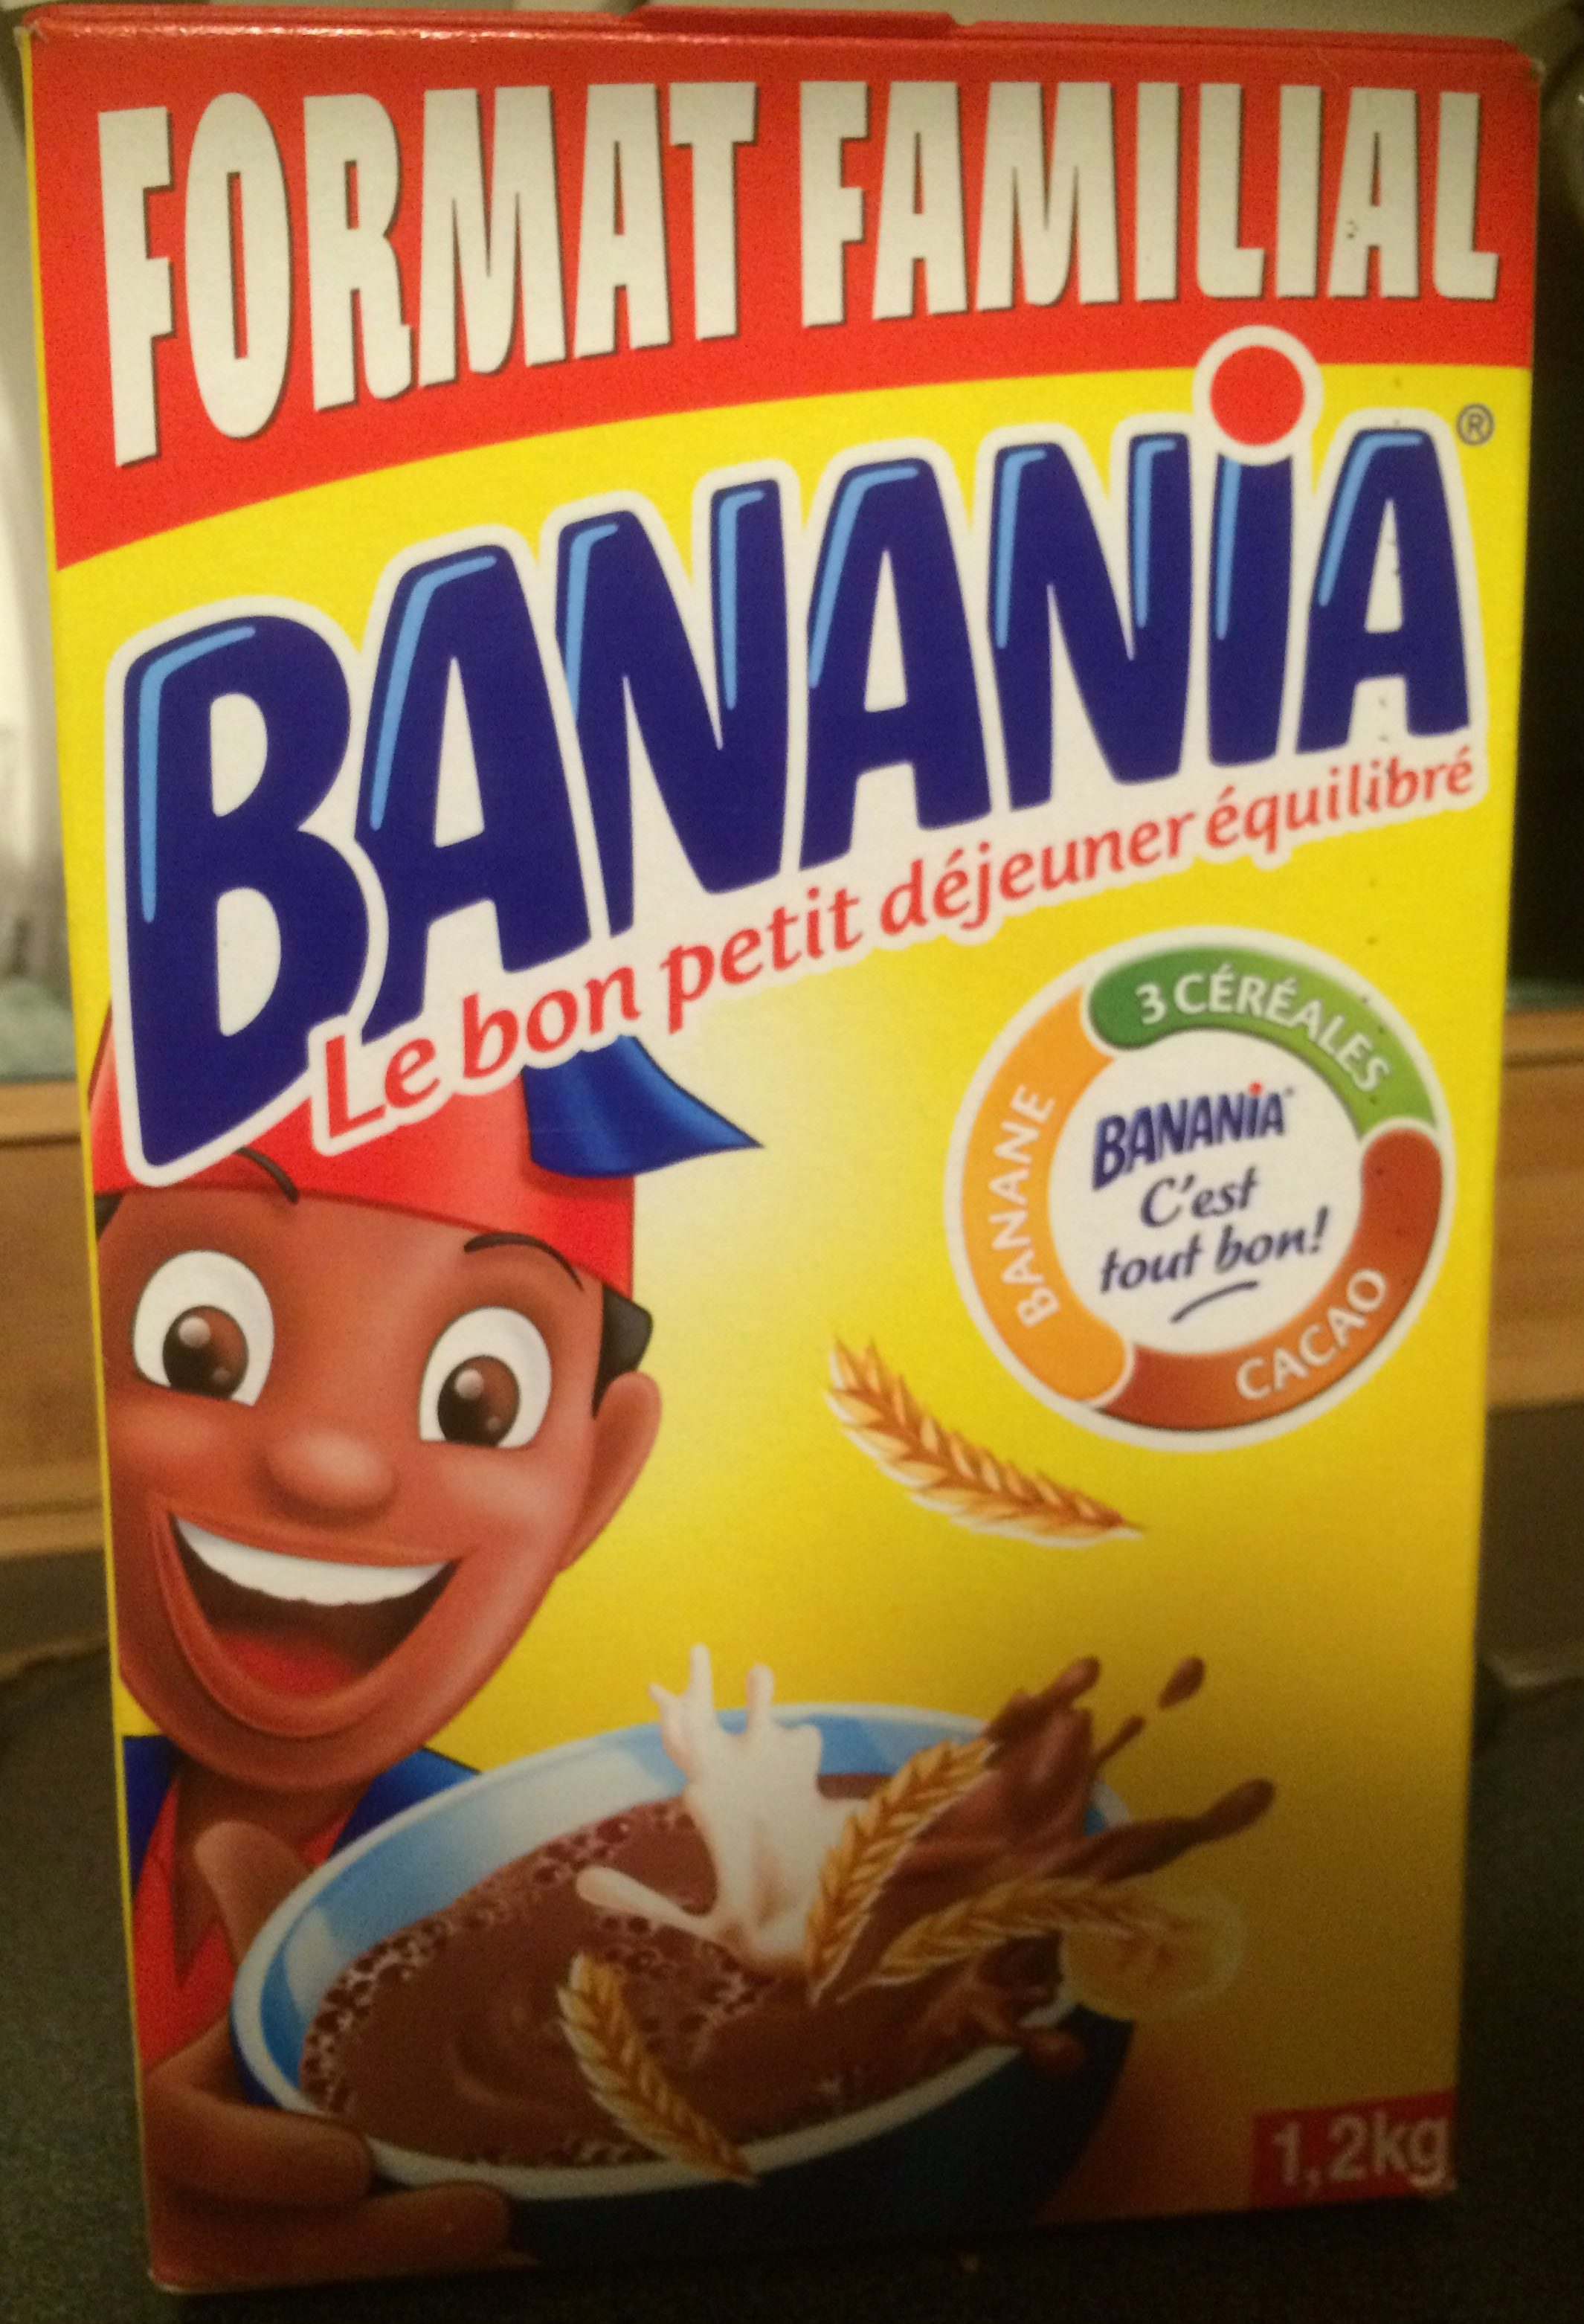 Banana Format Familial 1,2kg - Product